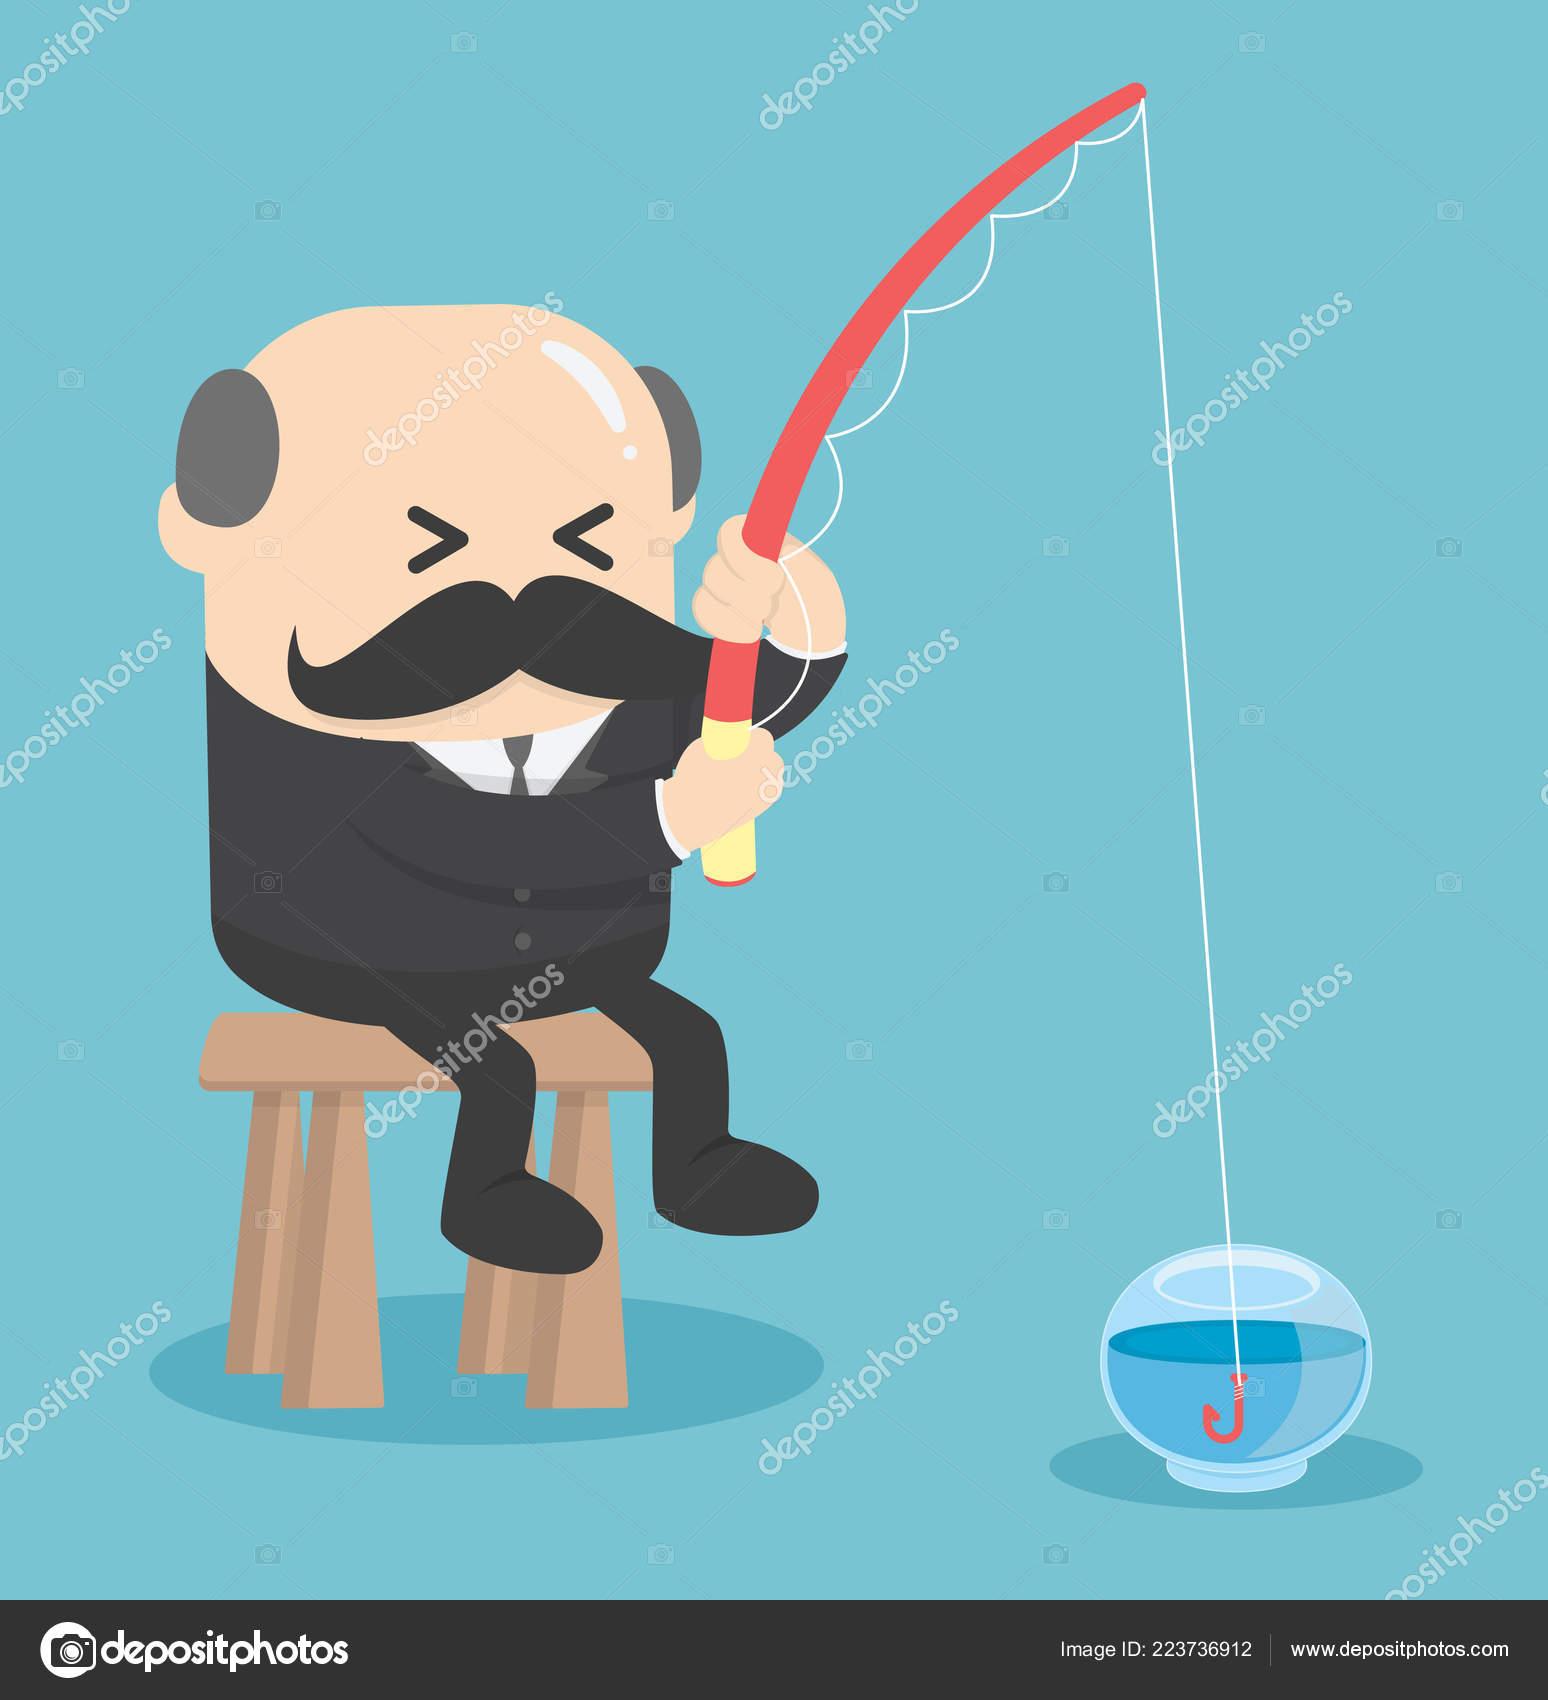 Business Konzept Cartoon Angeln Leeren Fish Tank Worthless Nutzlos